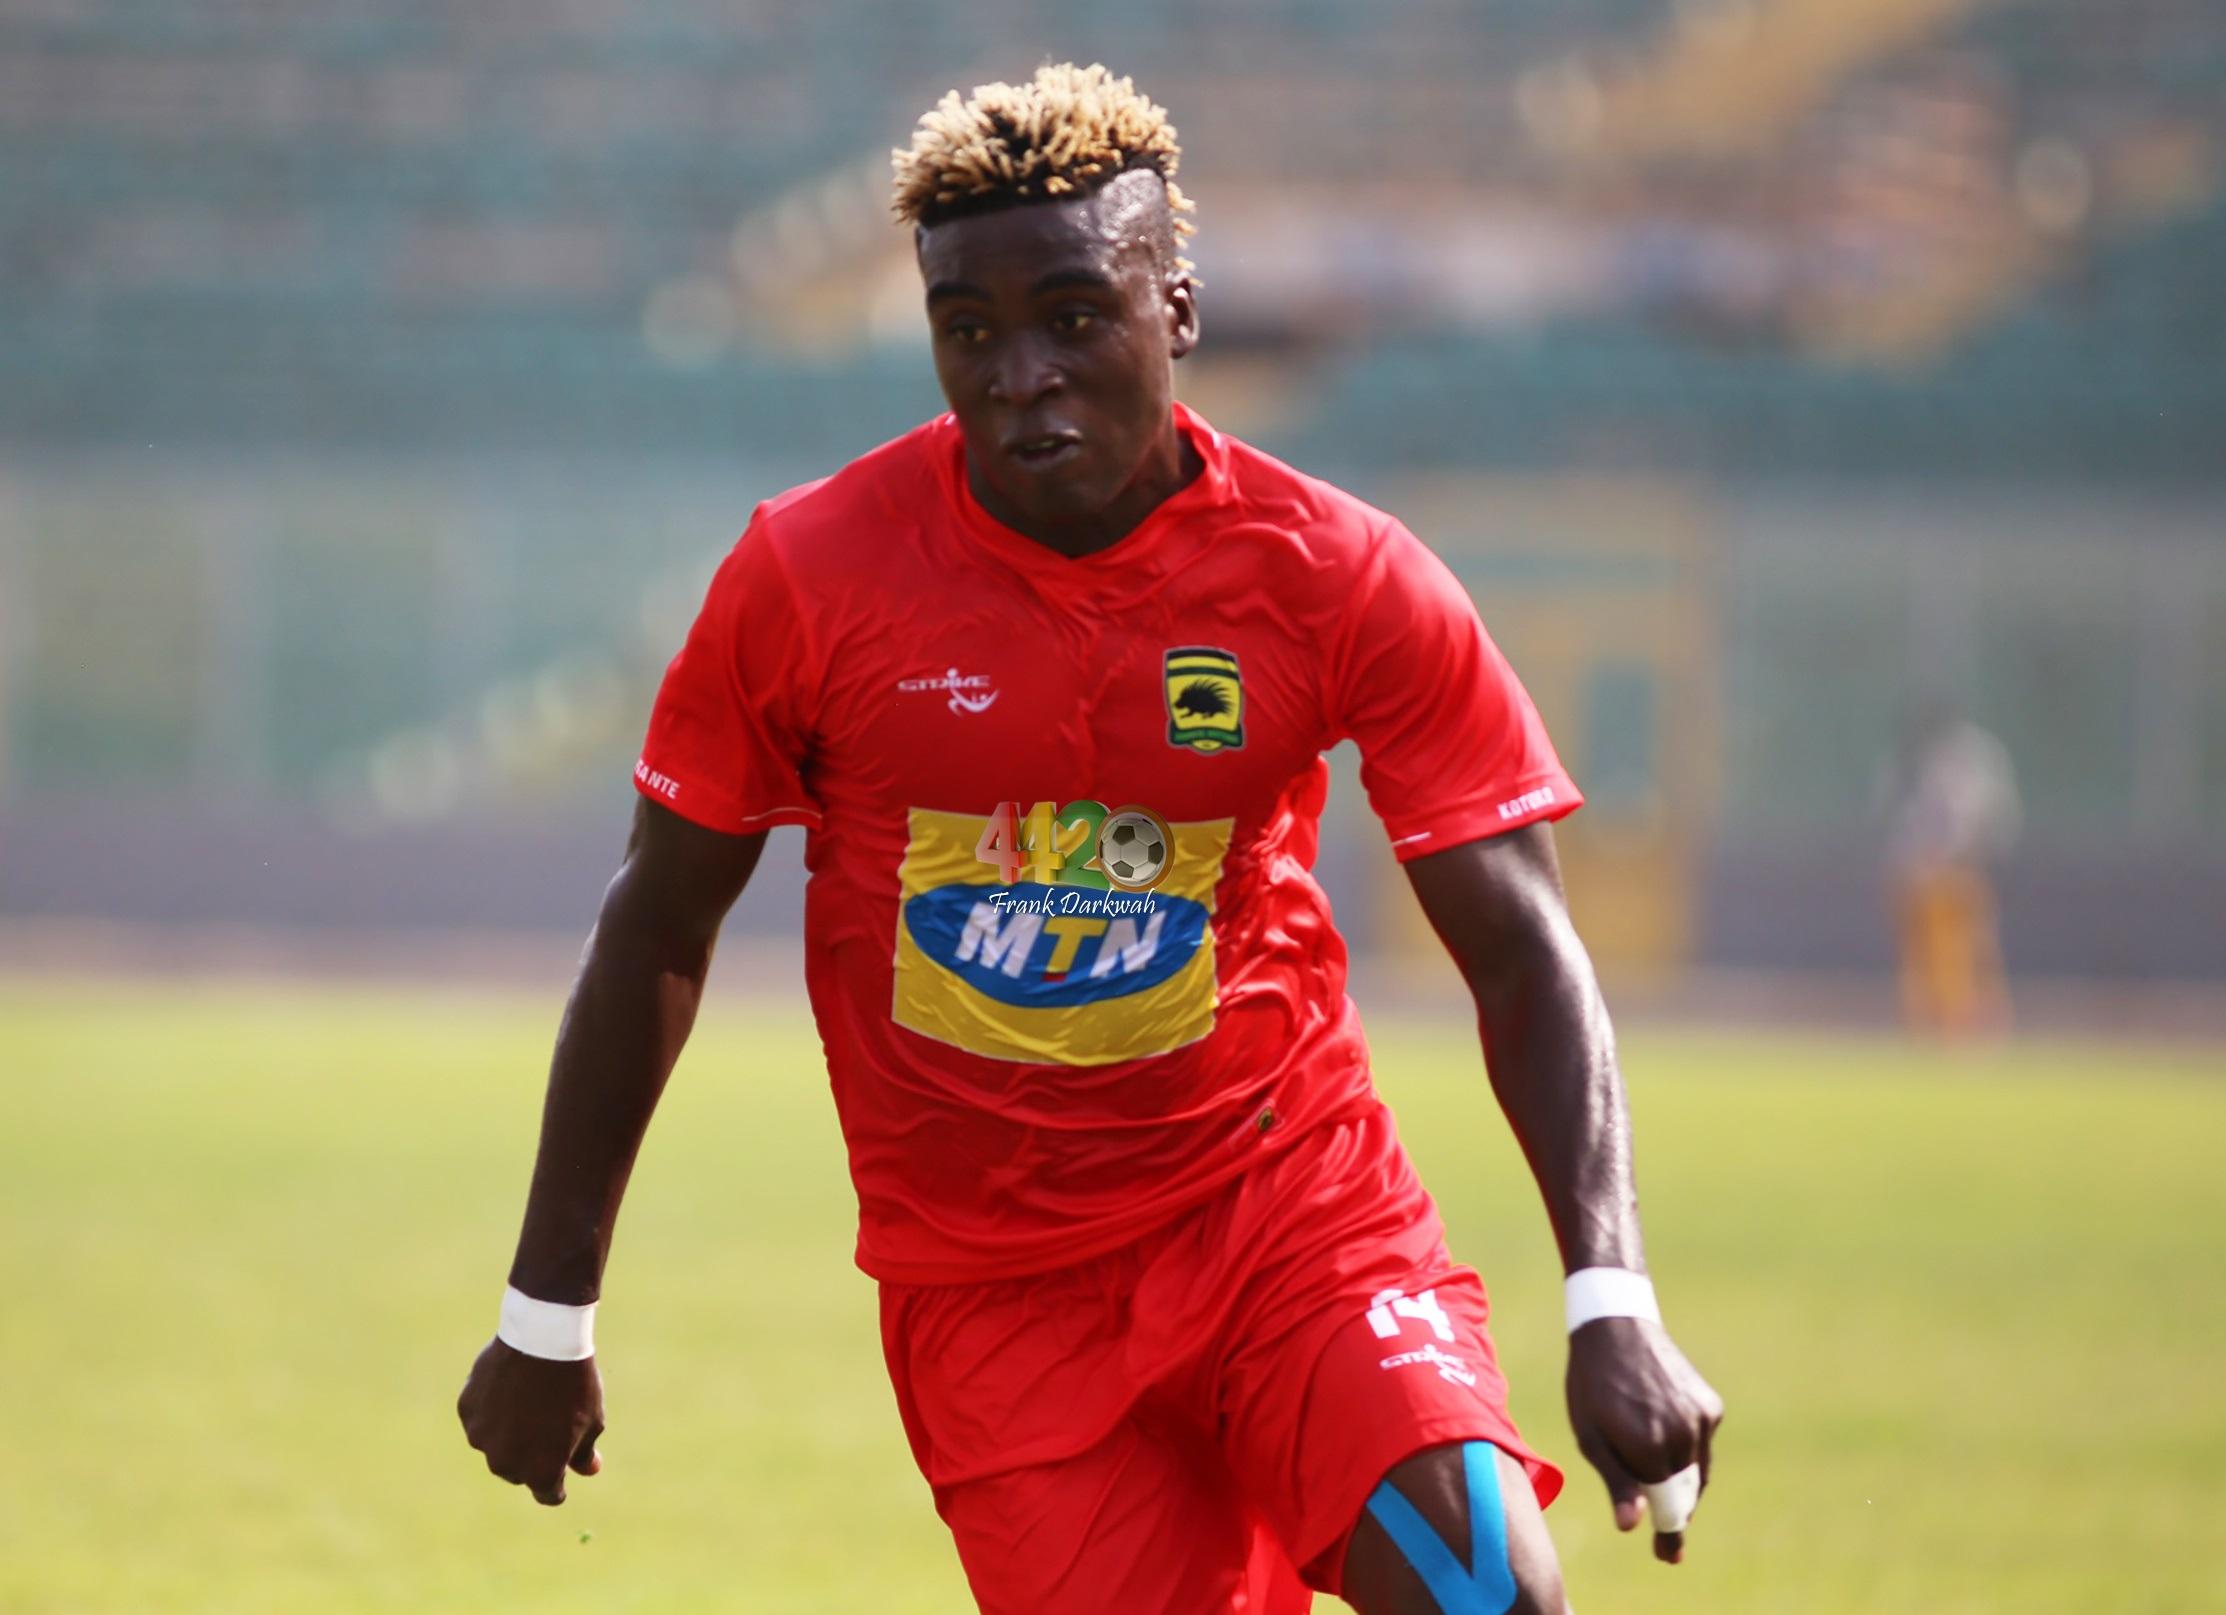 I'm not happy leaving Kotoko – Patrick Yeboah